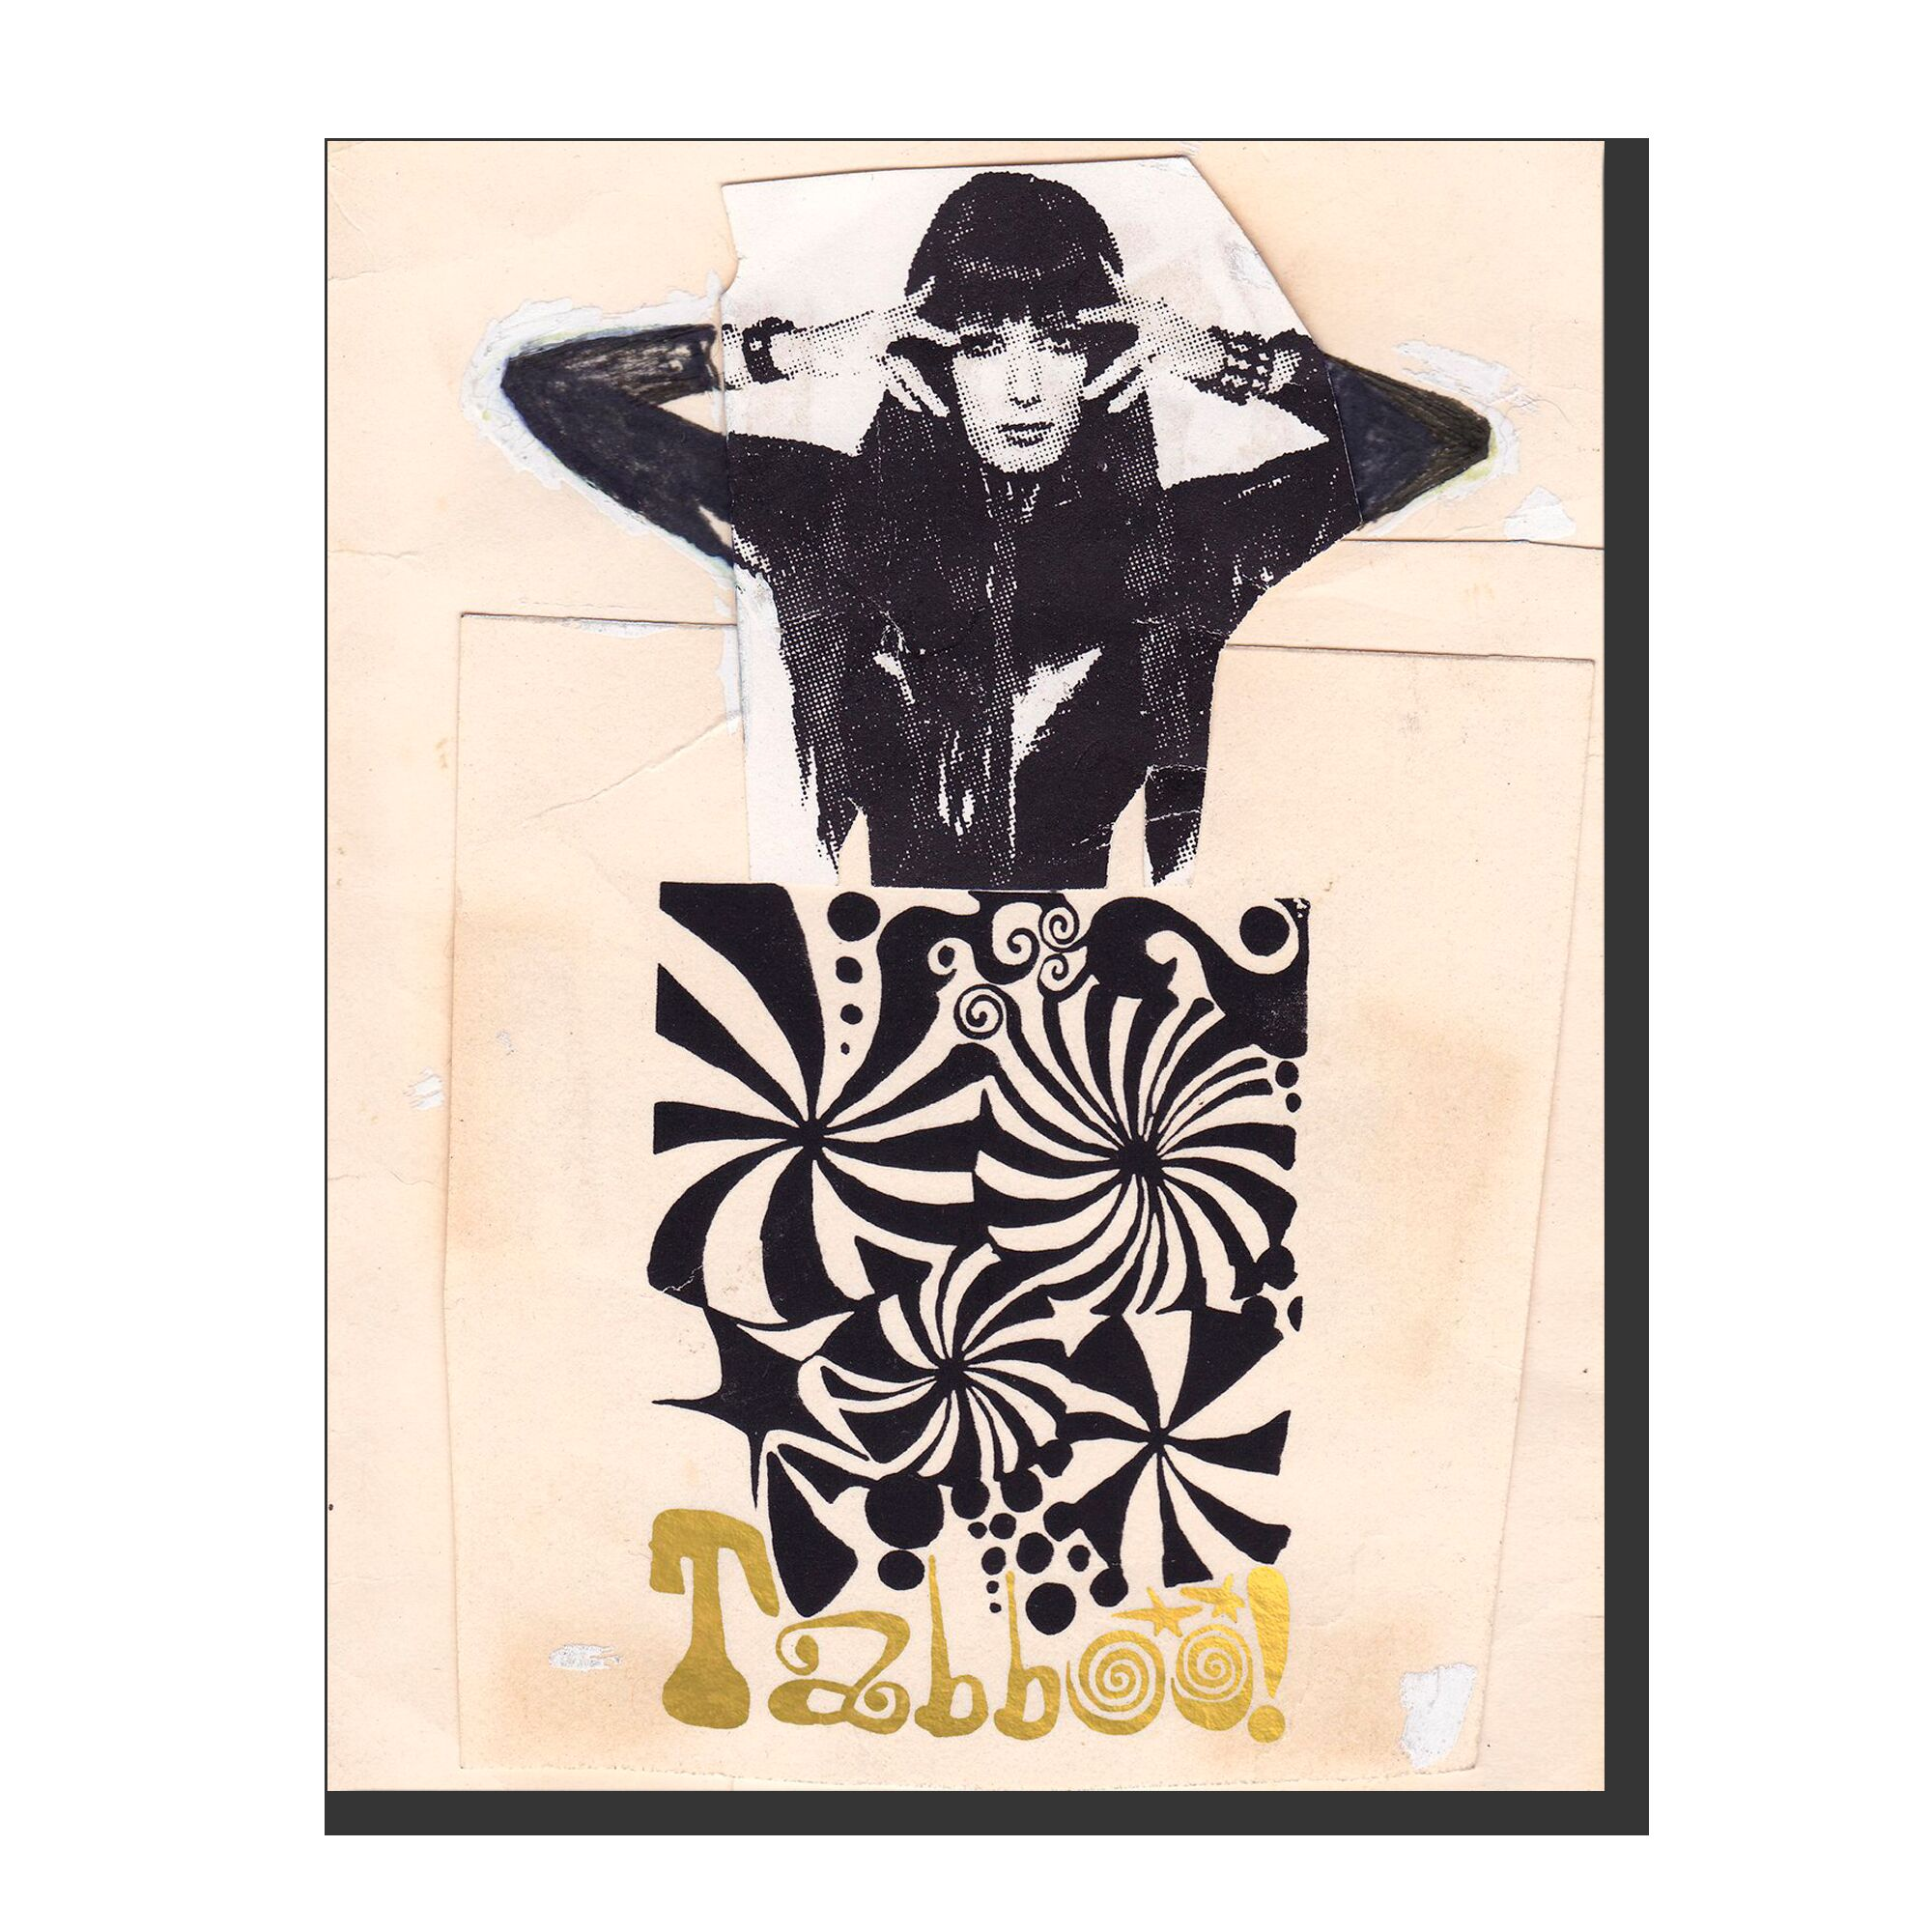 Tabboo! The Art of Stephen Tashjian